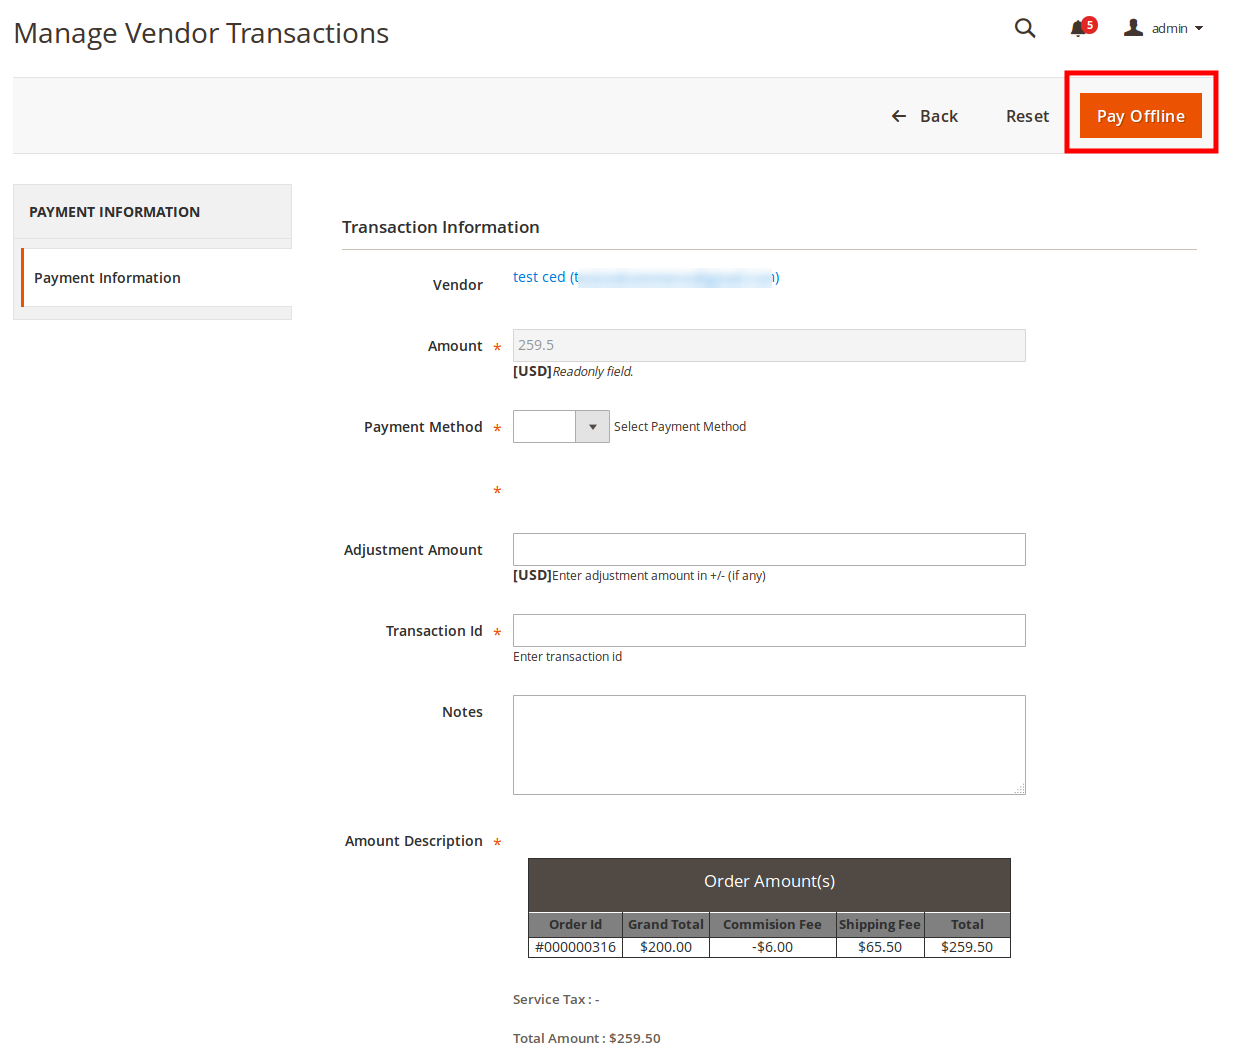 ManageVendorTransactionsPage_PayOfflineButton